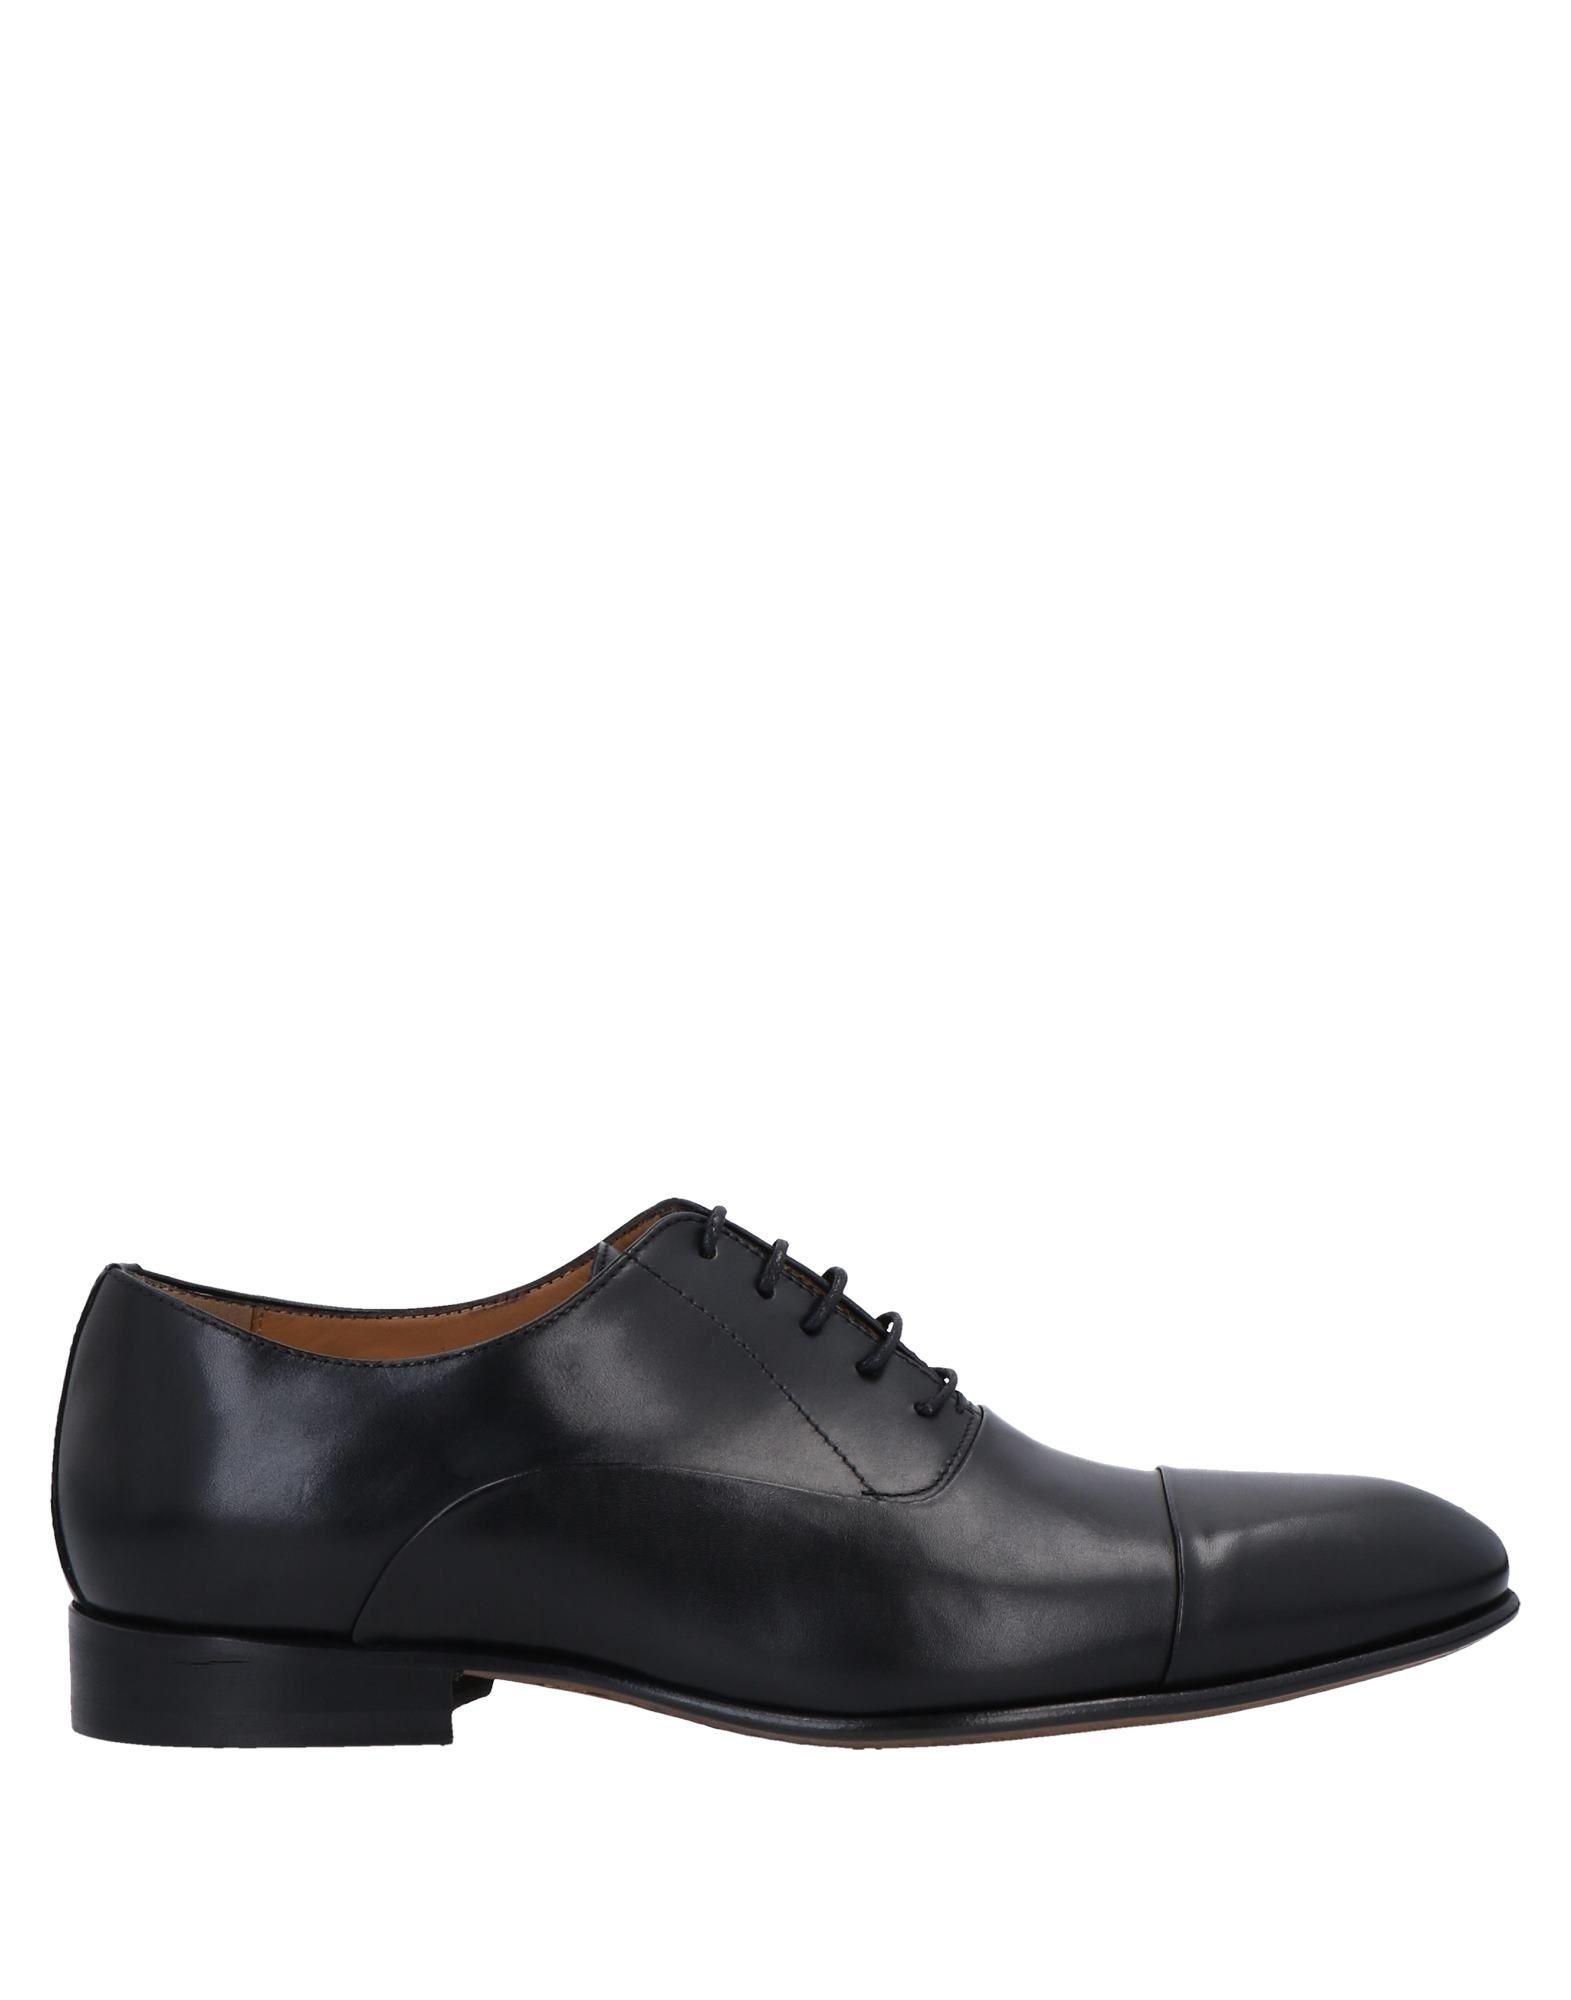 TROFEO by STEFANO BRANCHINI Обувь на шнурках stefano branchini обувь на шнурках